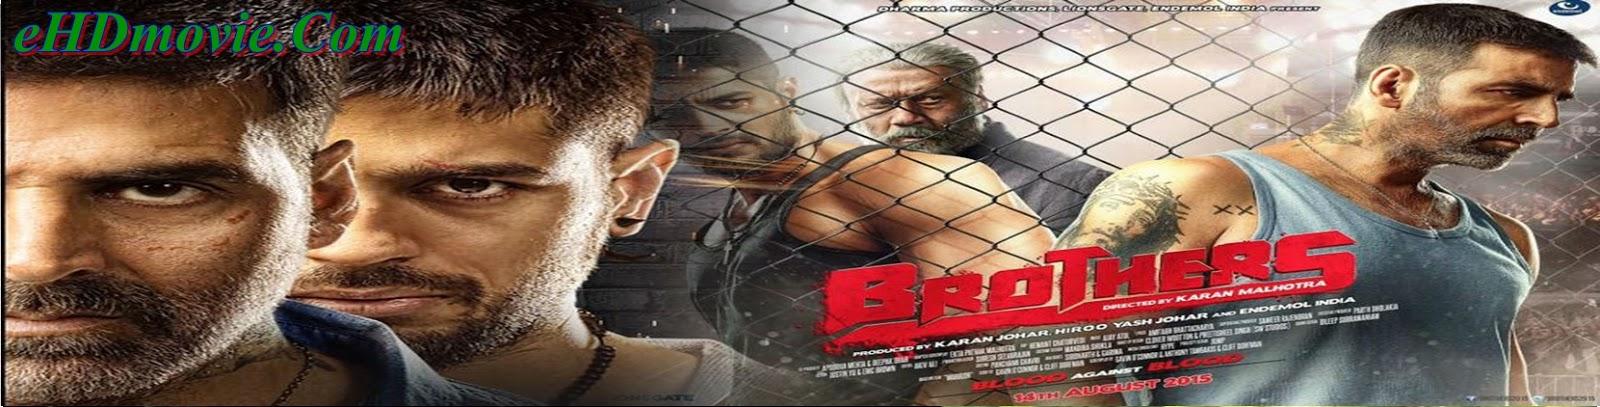 Brothers 2015 Full Movie Hindi 720p - 480p ORG BRRip 450MB - 1.7GB ESubs Free Download